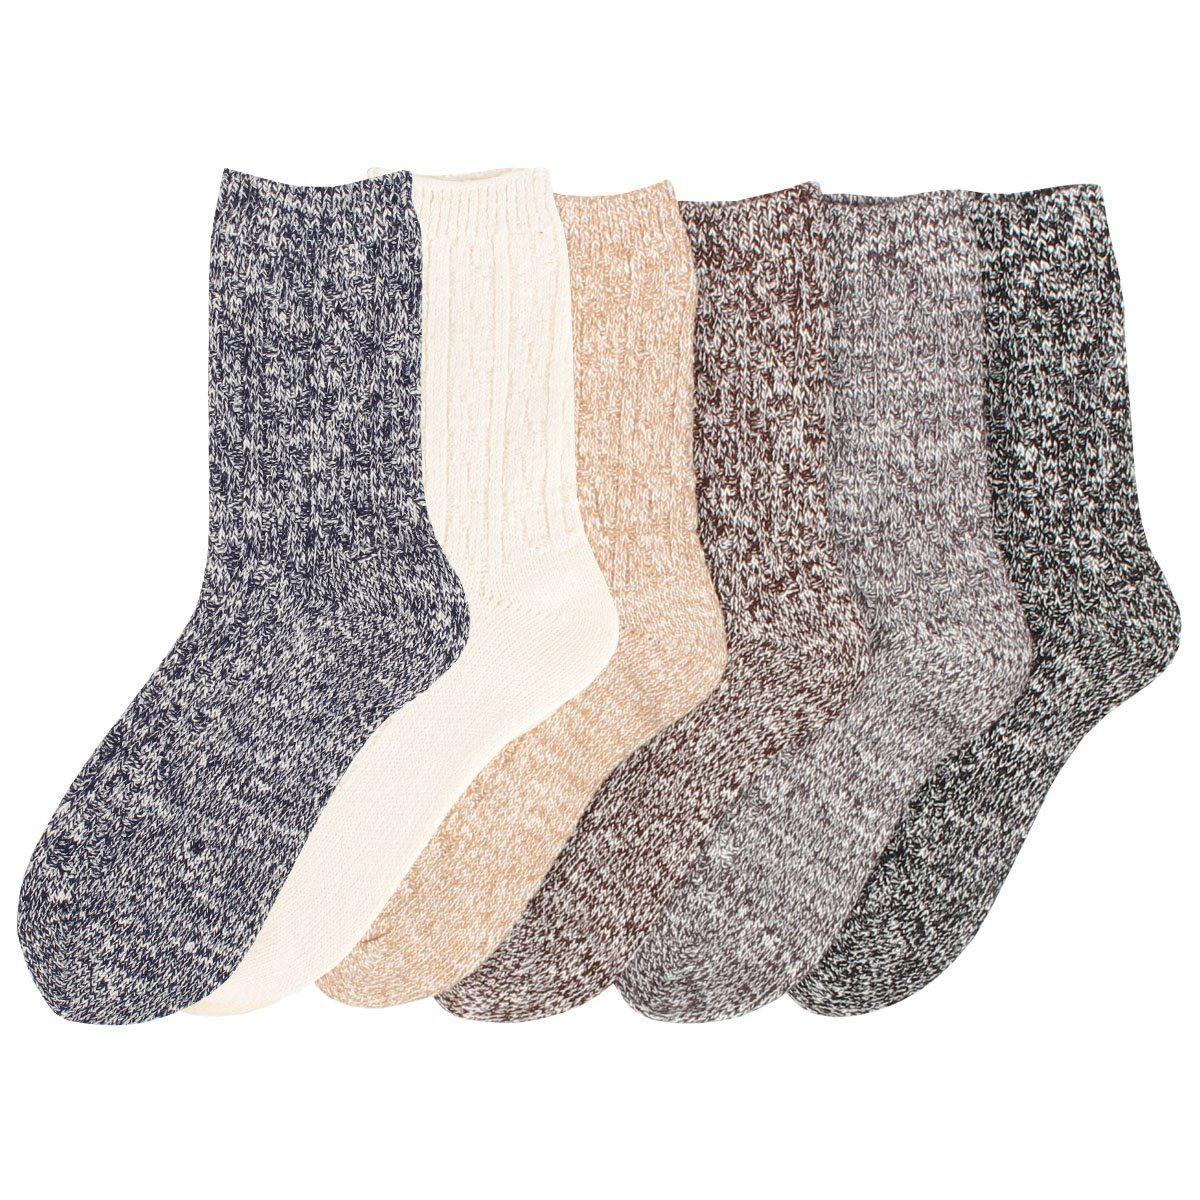 Womens Men Solid Cotton Soft Long Socks Warm Autumn Winter Socks Vintage